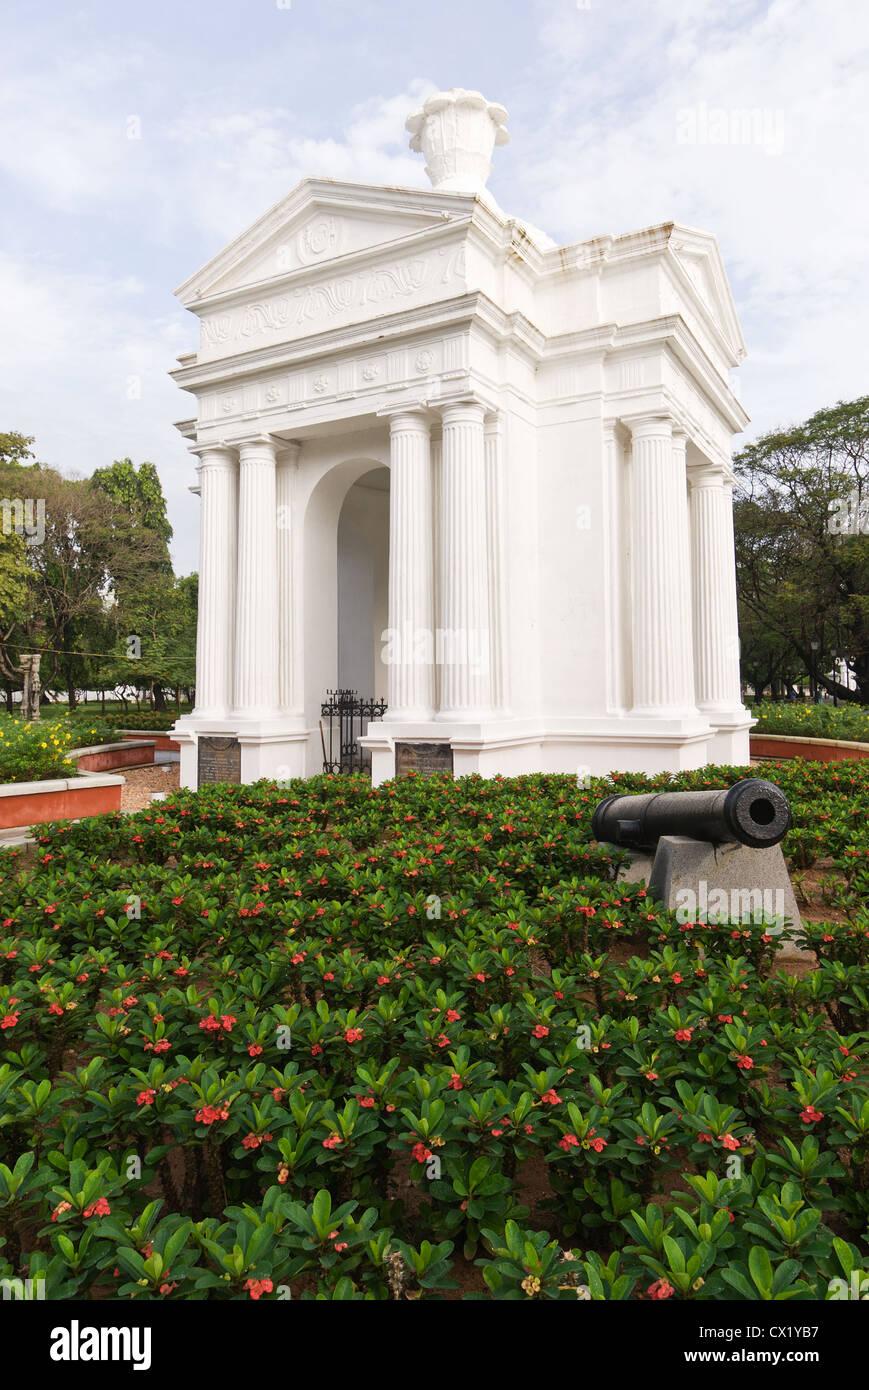 Elk201-4428v India, Tamil Nadu, Pondicherry, Government Square - Stock Image